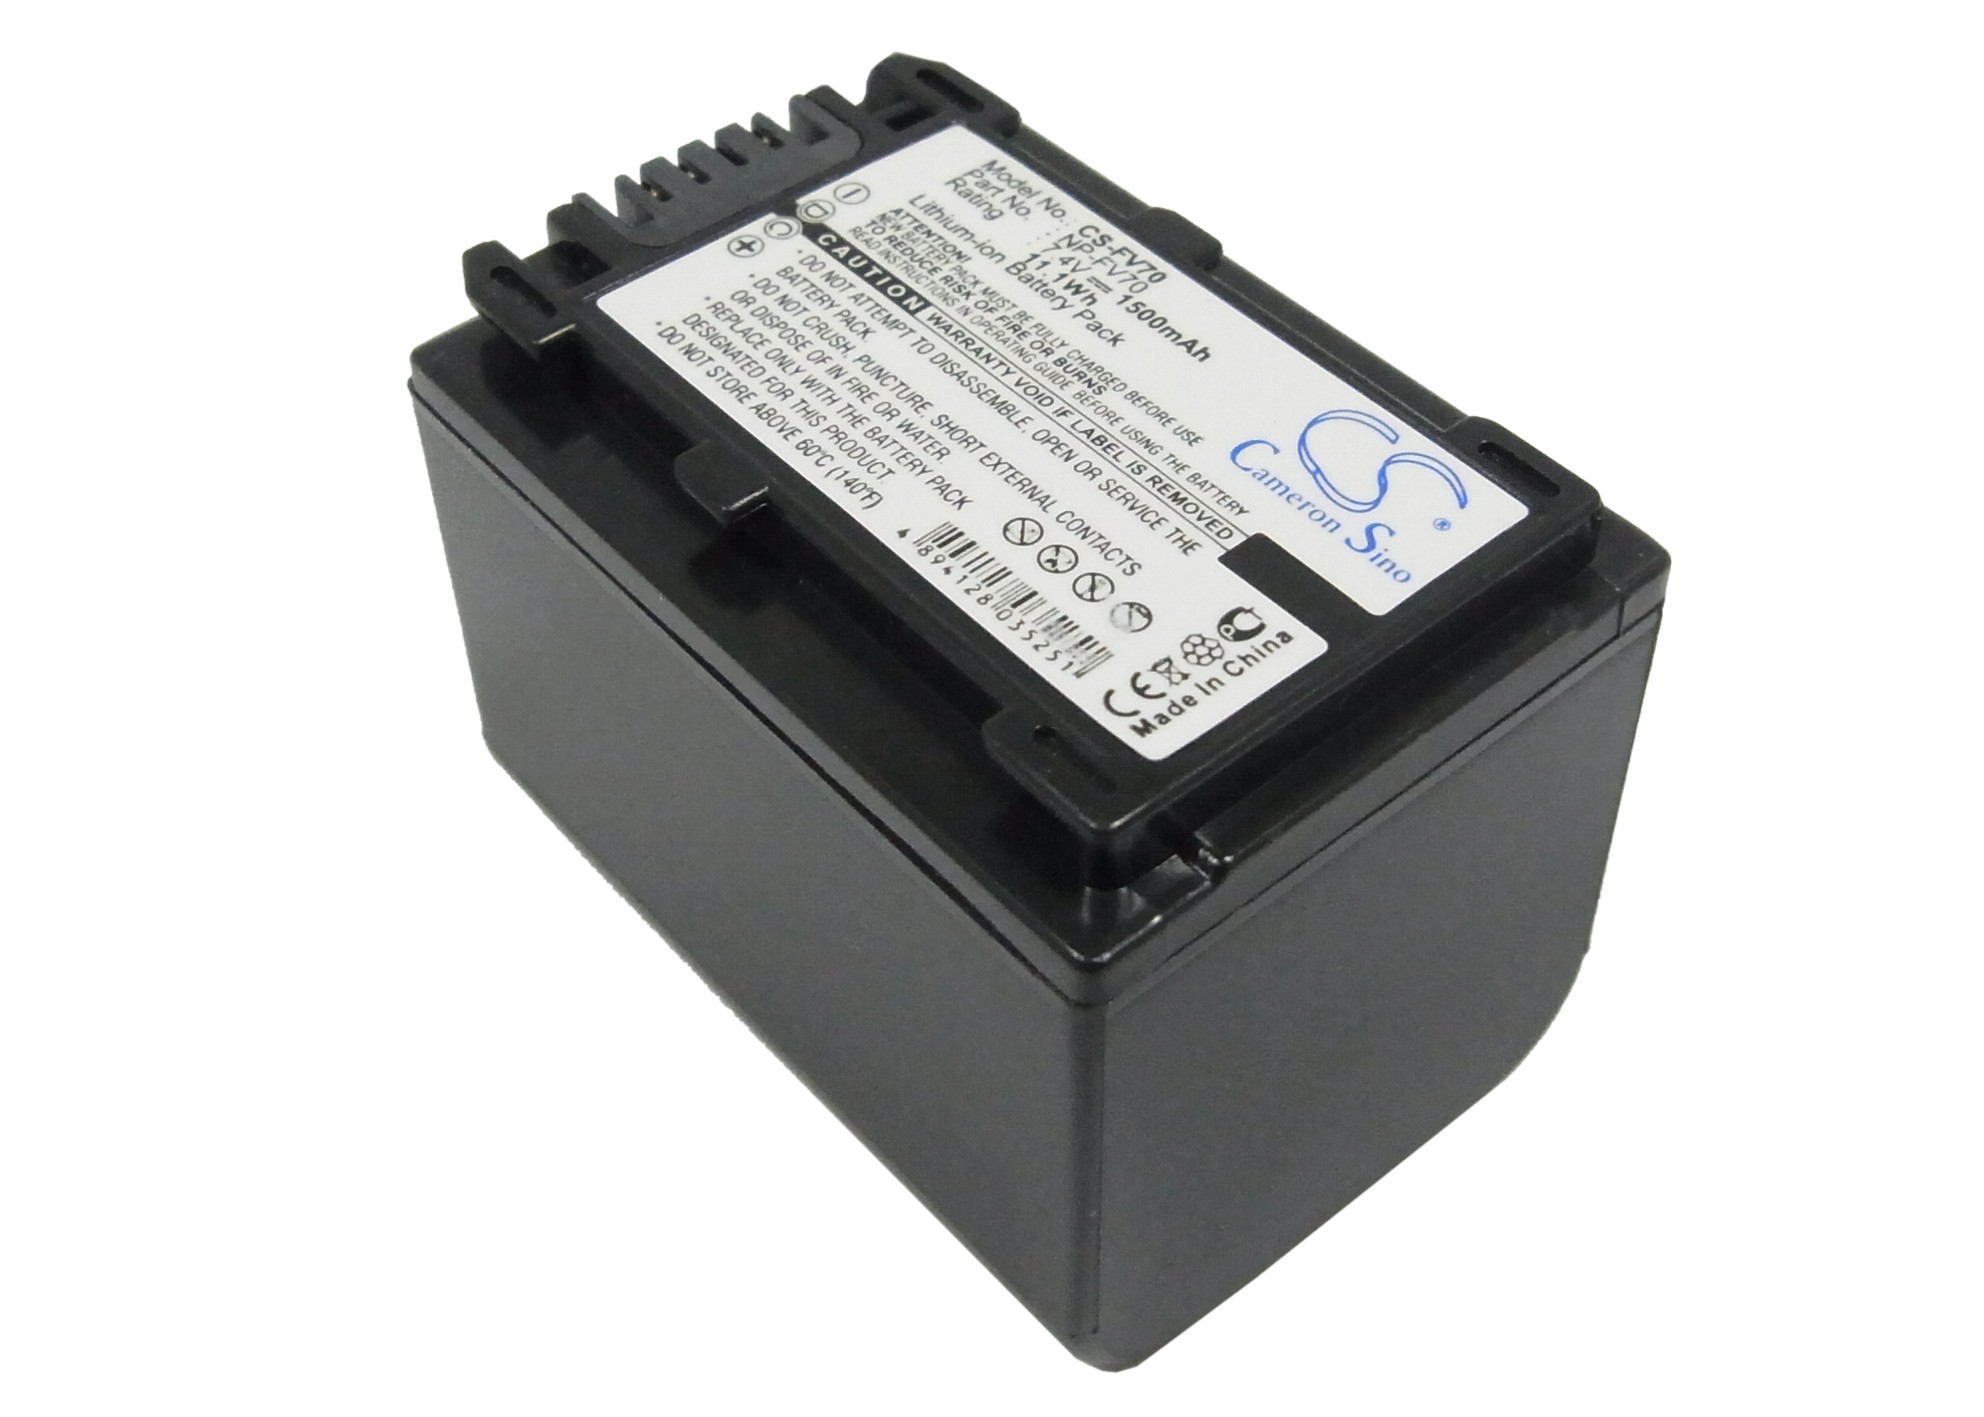 Cameron Sino baterie do kamer a fotoaparátů pro SONY DCR-SX33E 7.4V Li-ion 1500mAh černá - neoriginální